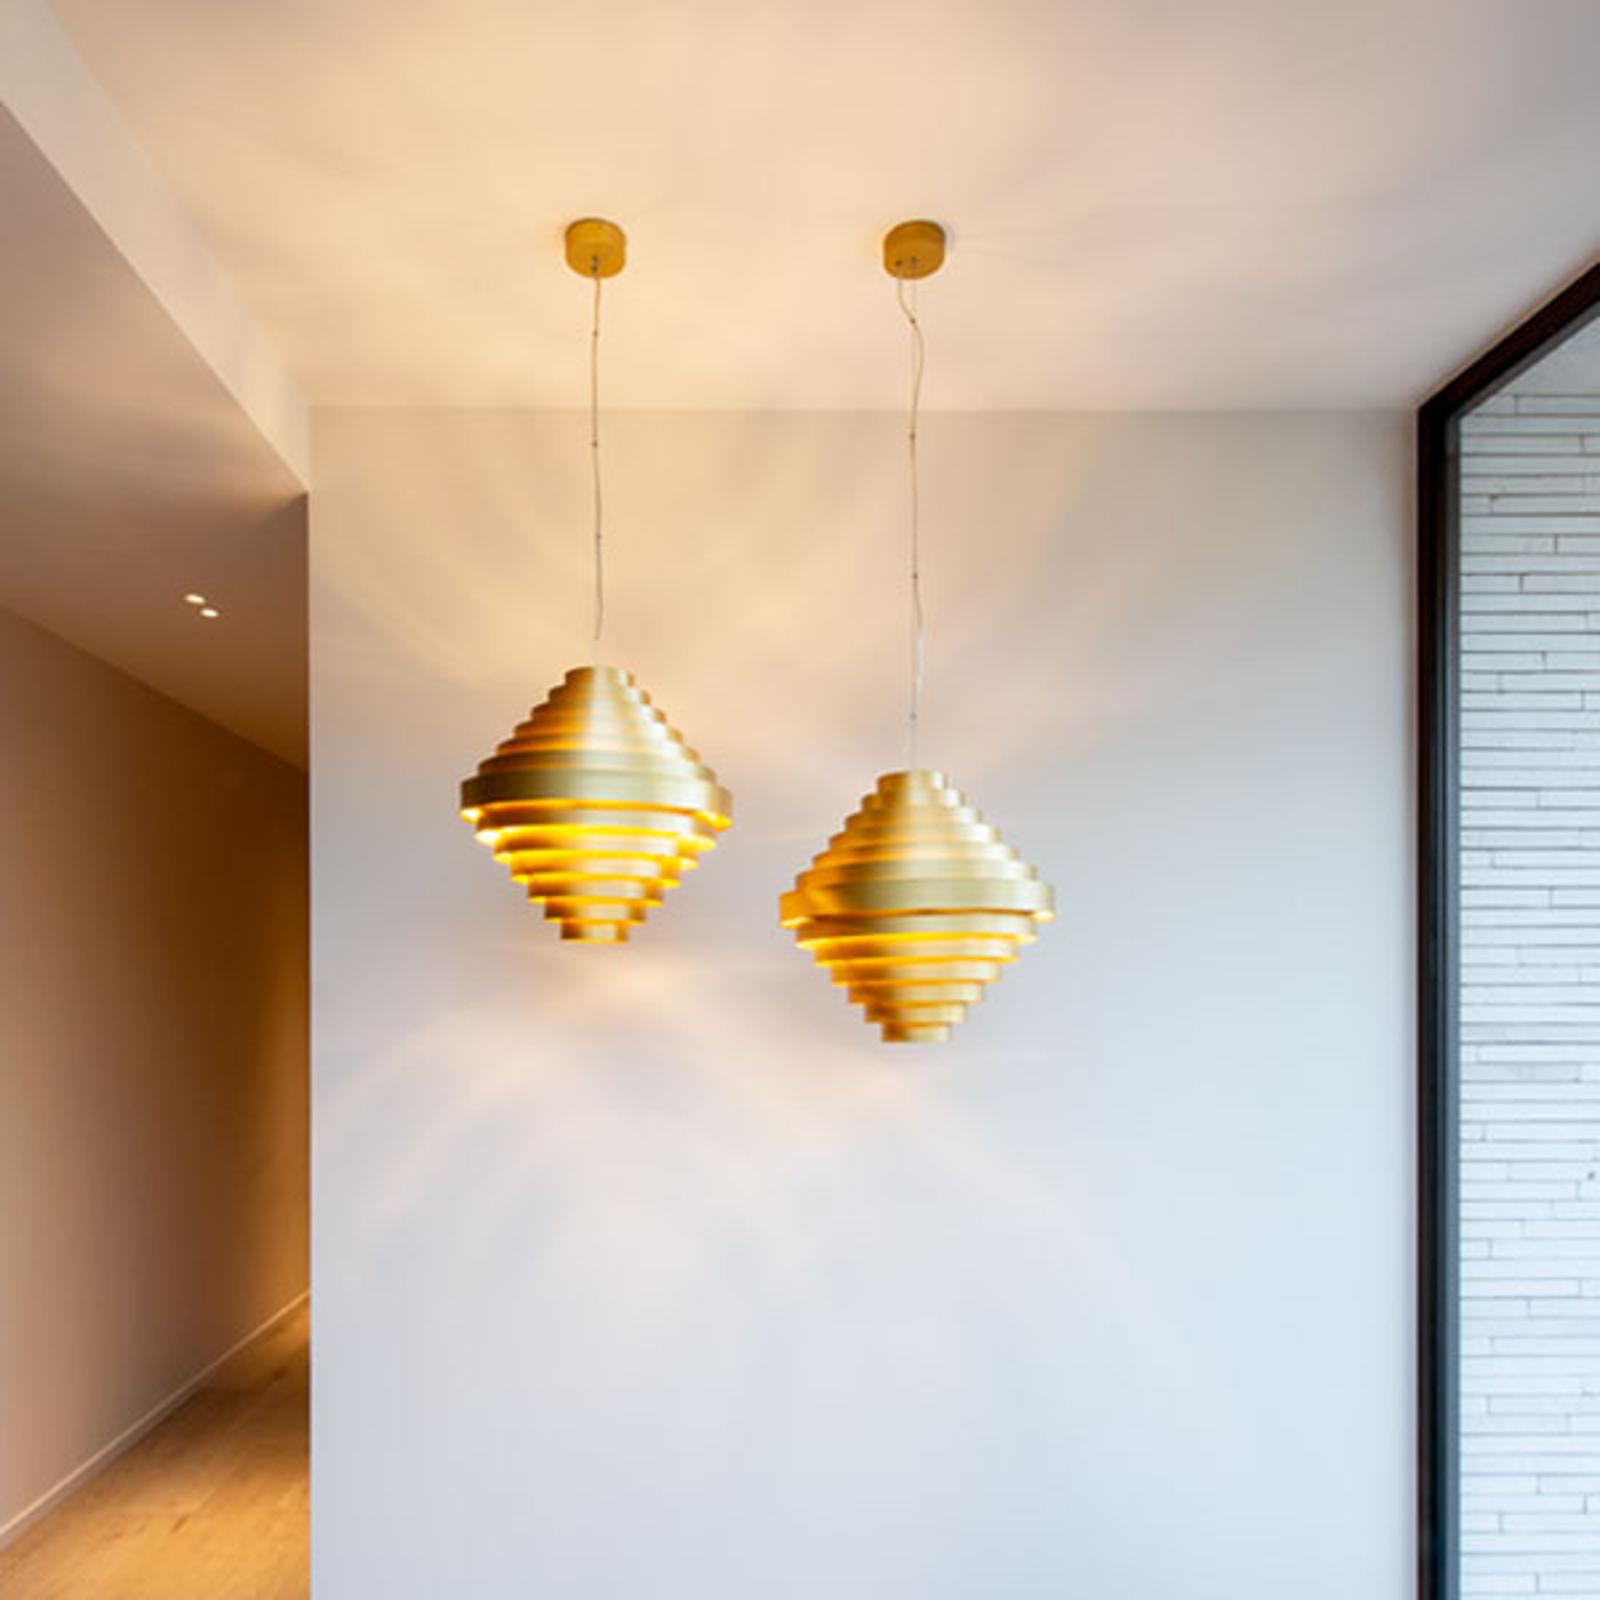 WEVER & DUCRÉ J.J.W. 05 hanglamp goud